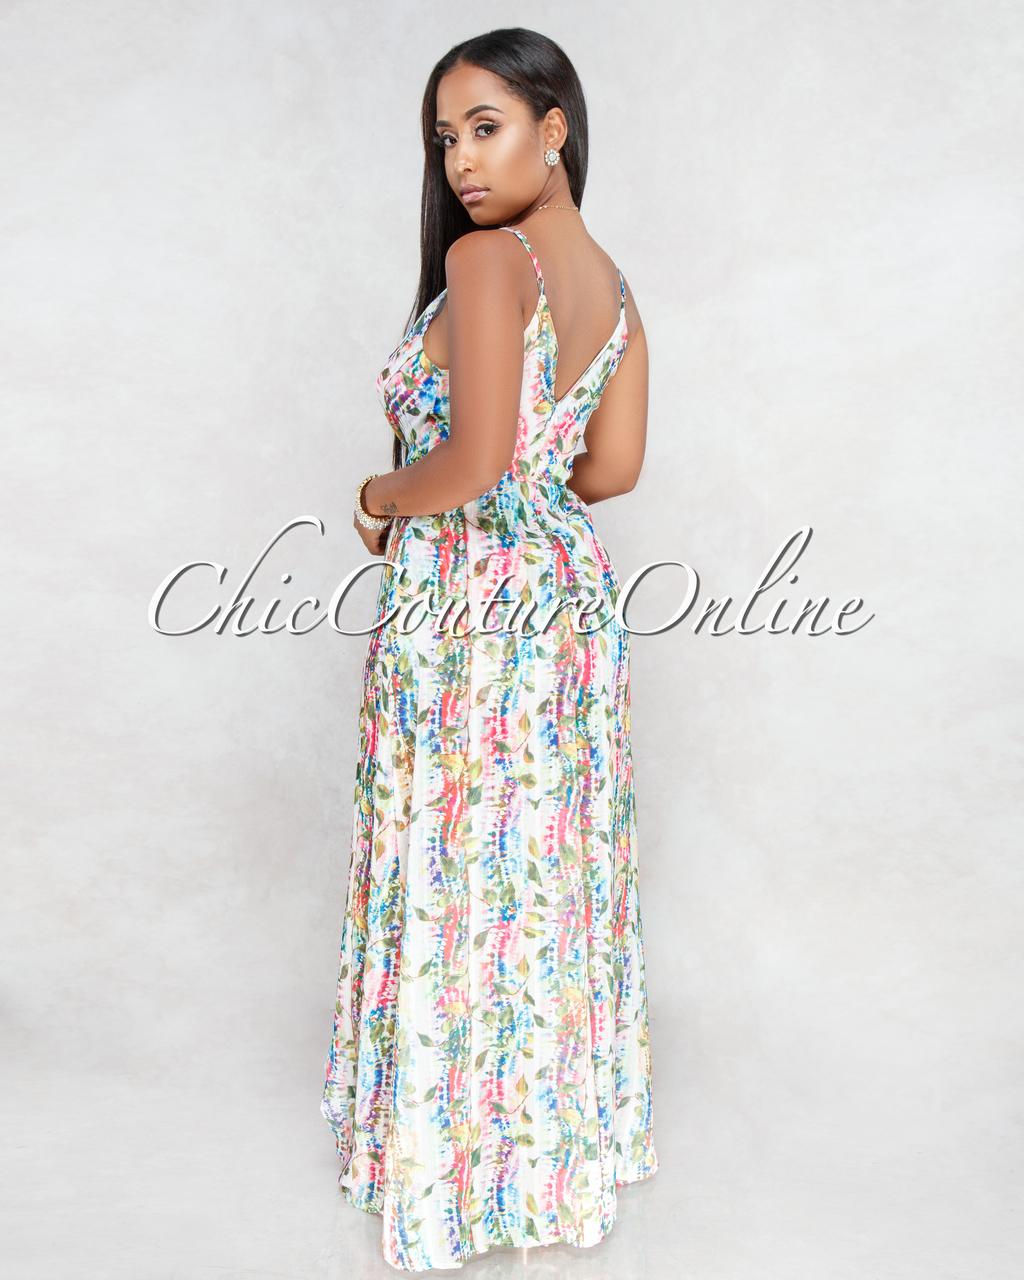 Azalea Ivory Multi Color Print Romper Maxi Dress